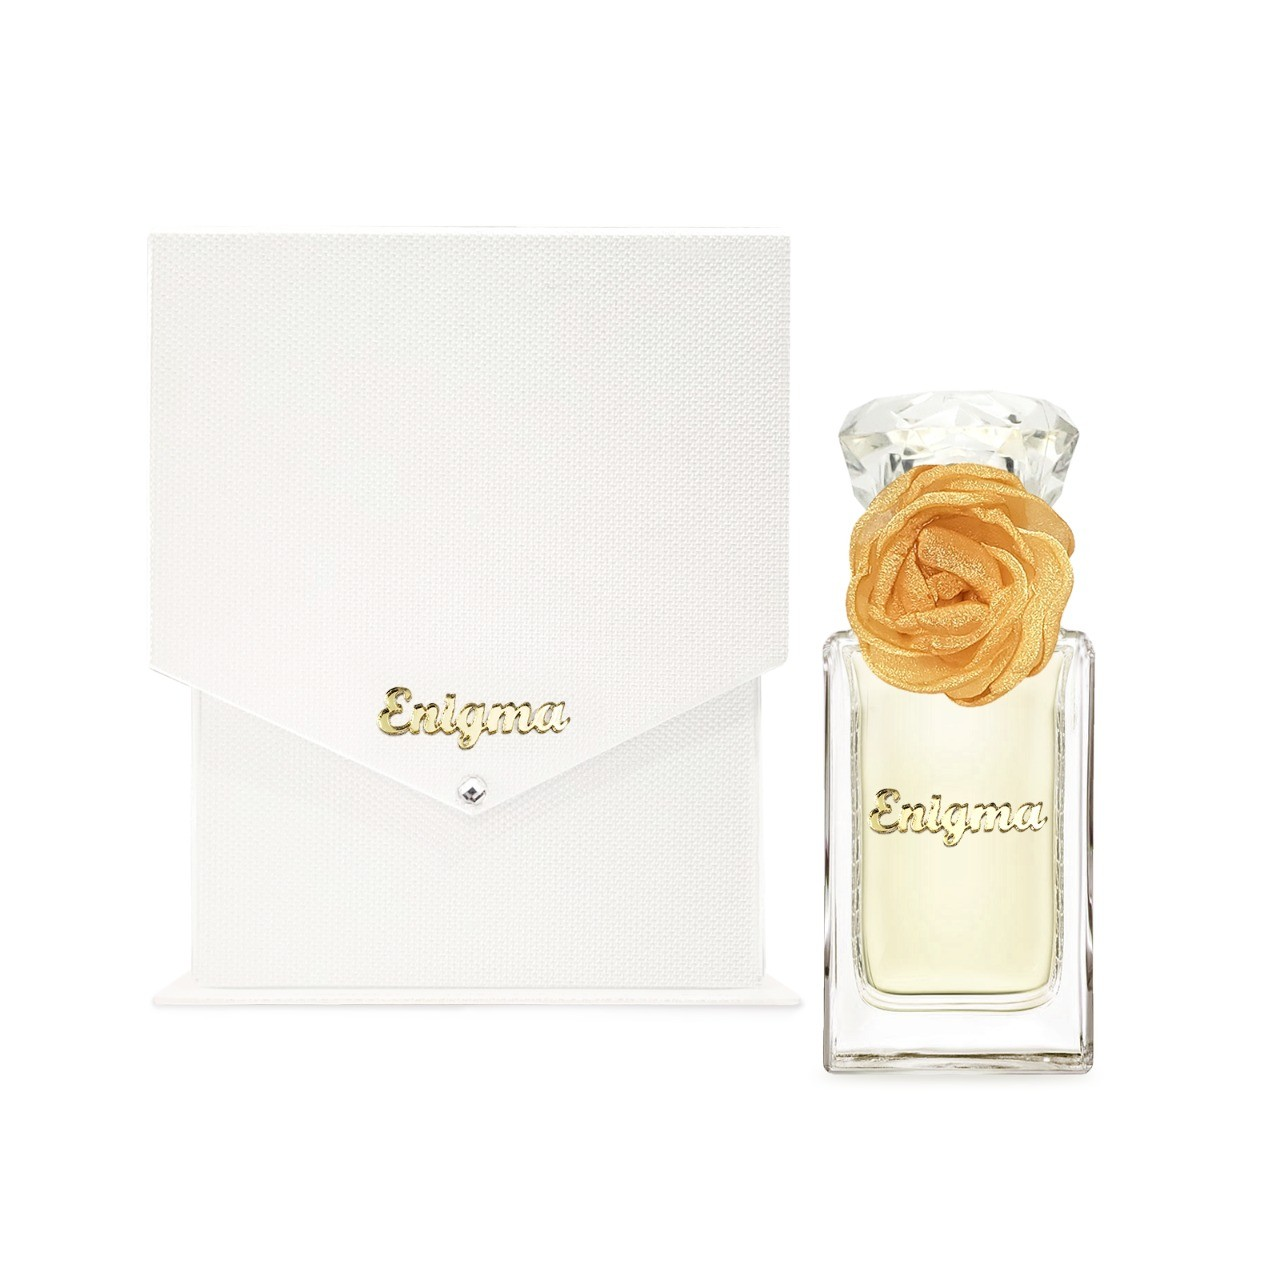 Perfume Enigma 50ml